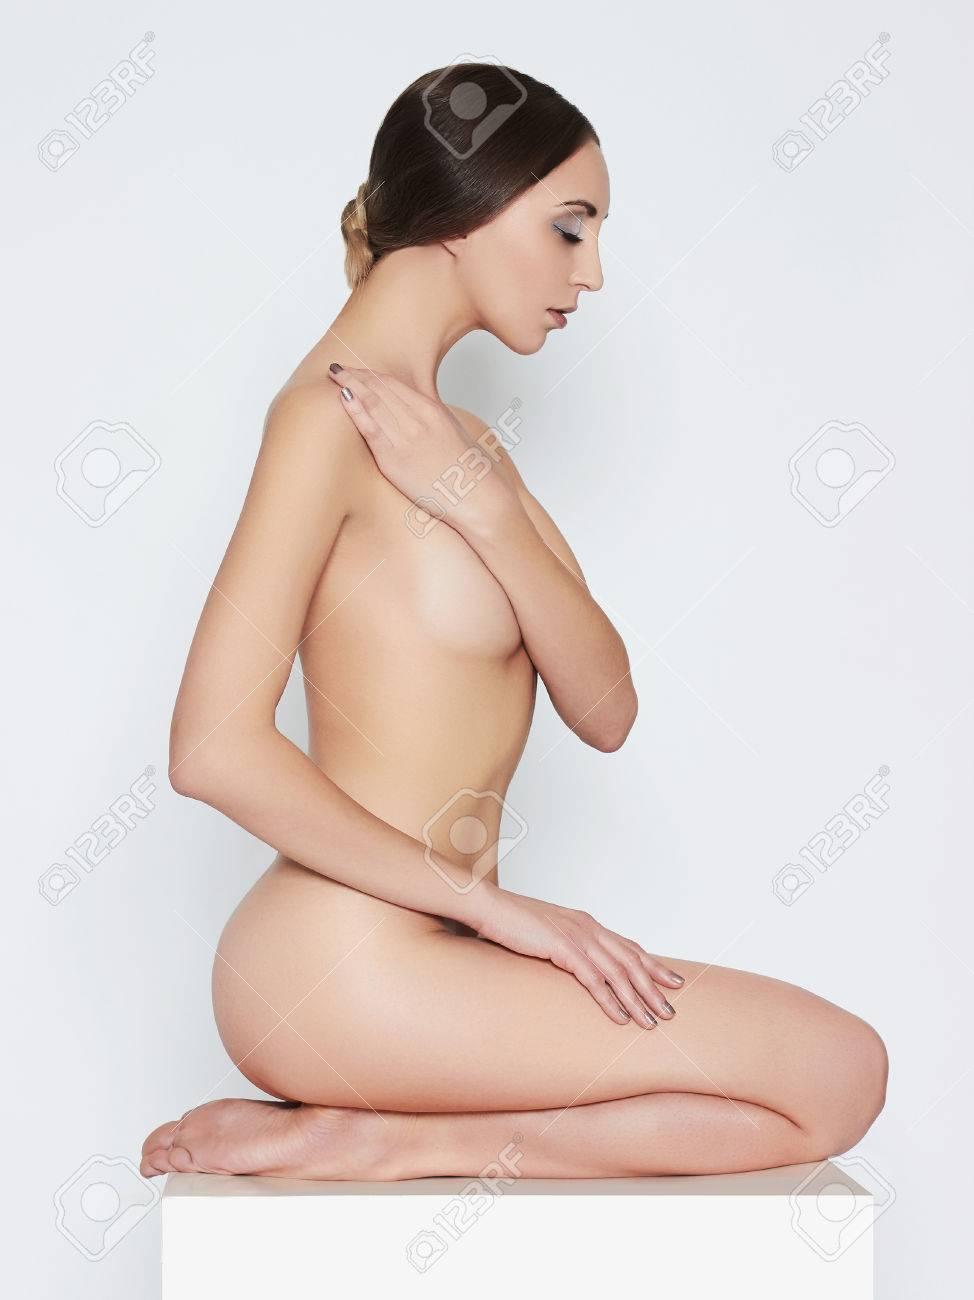 Naked girls sitting on